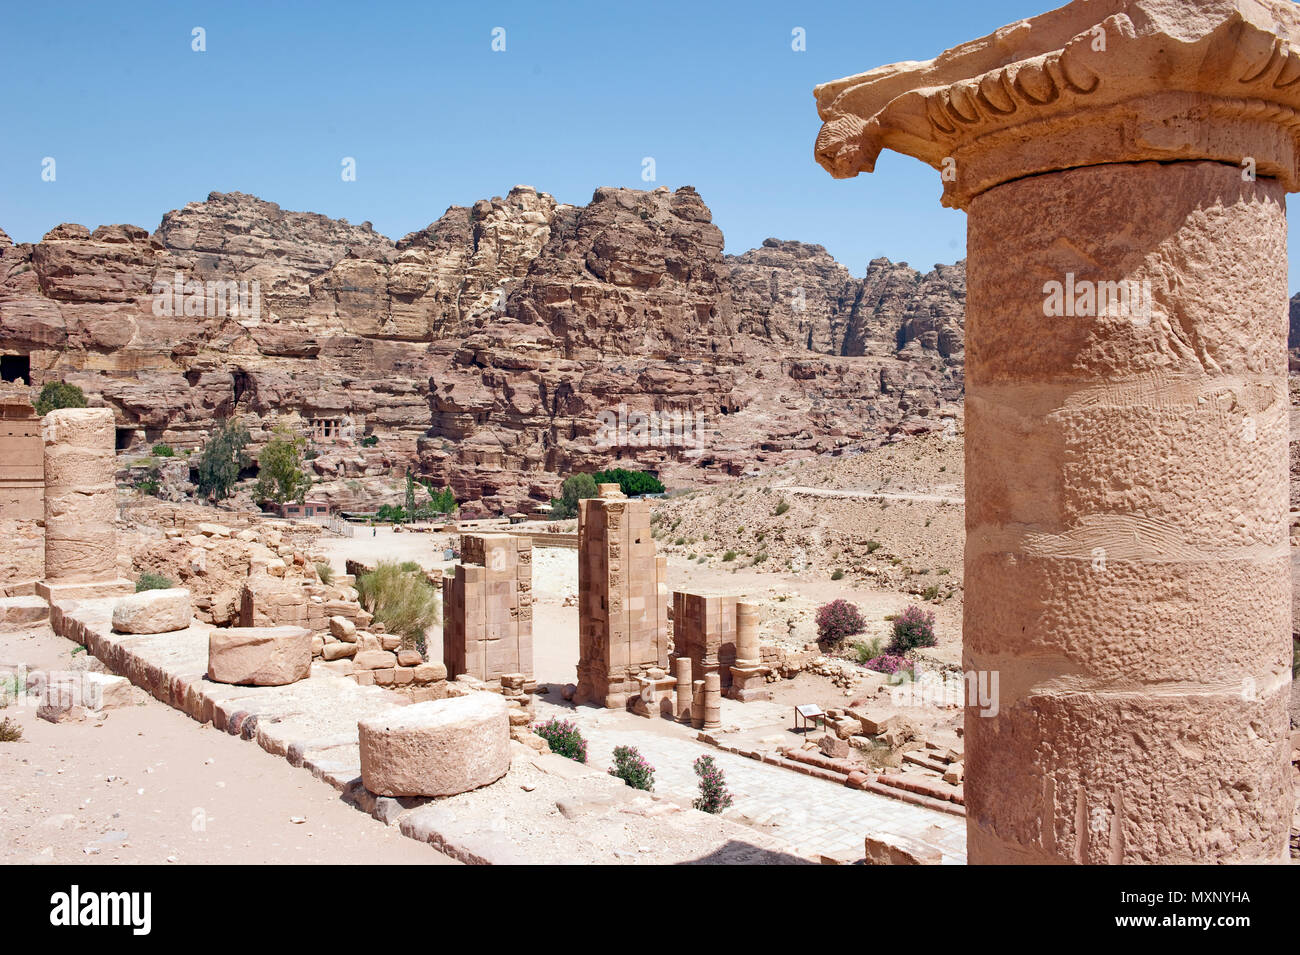 Great temple, Petra, Jordan, Asia minor | Grosser Tempel, Petra, Jordanien, Kleinasien Stock Photo